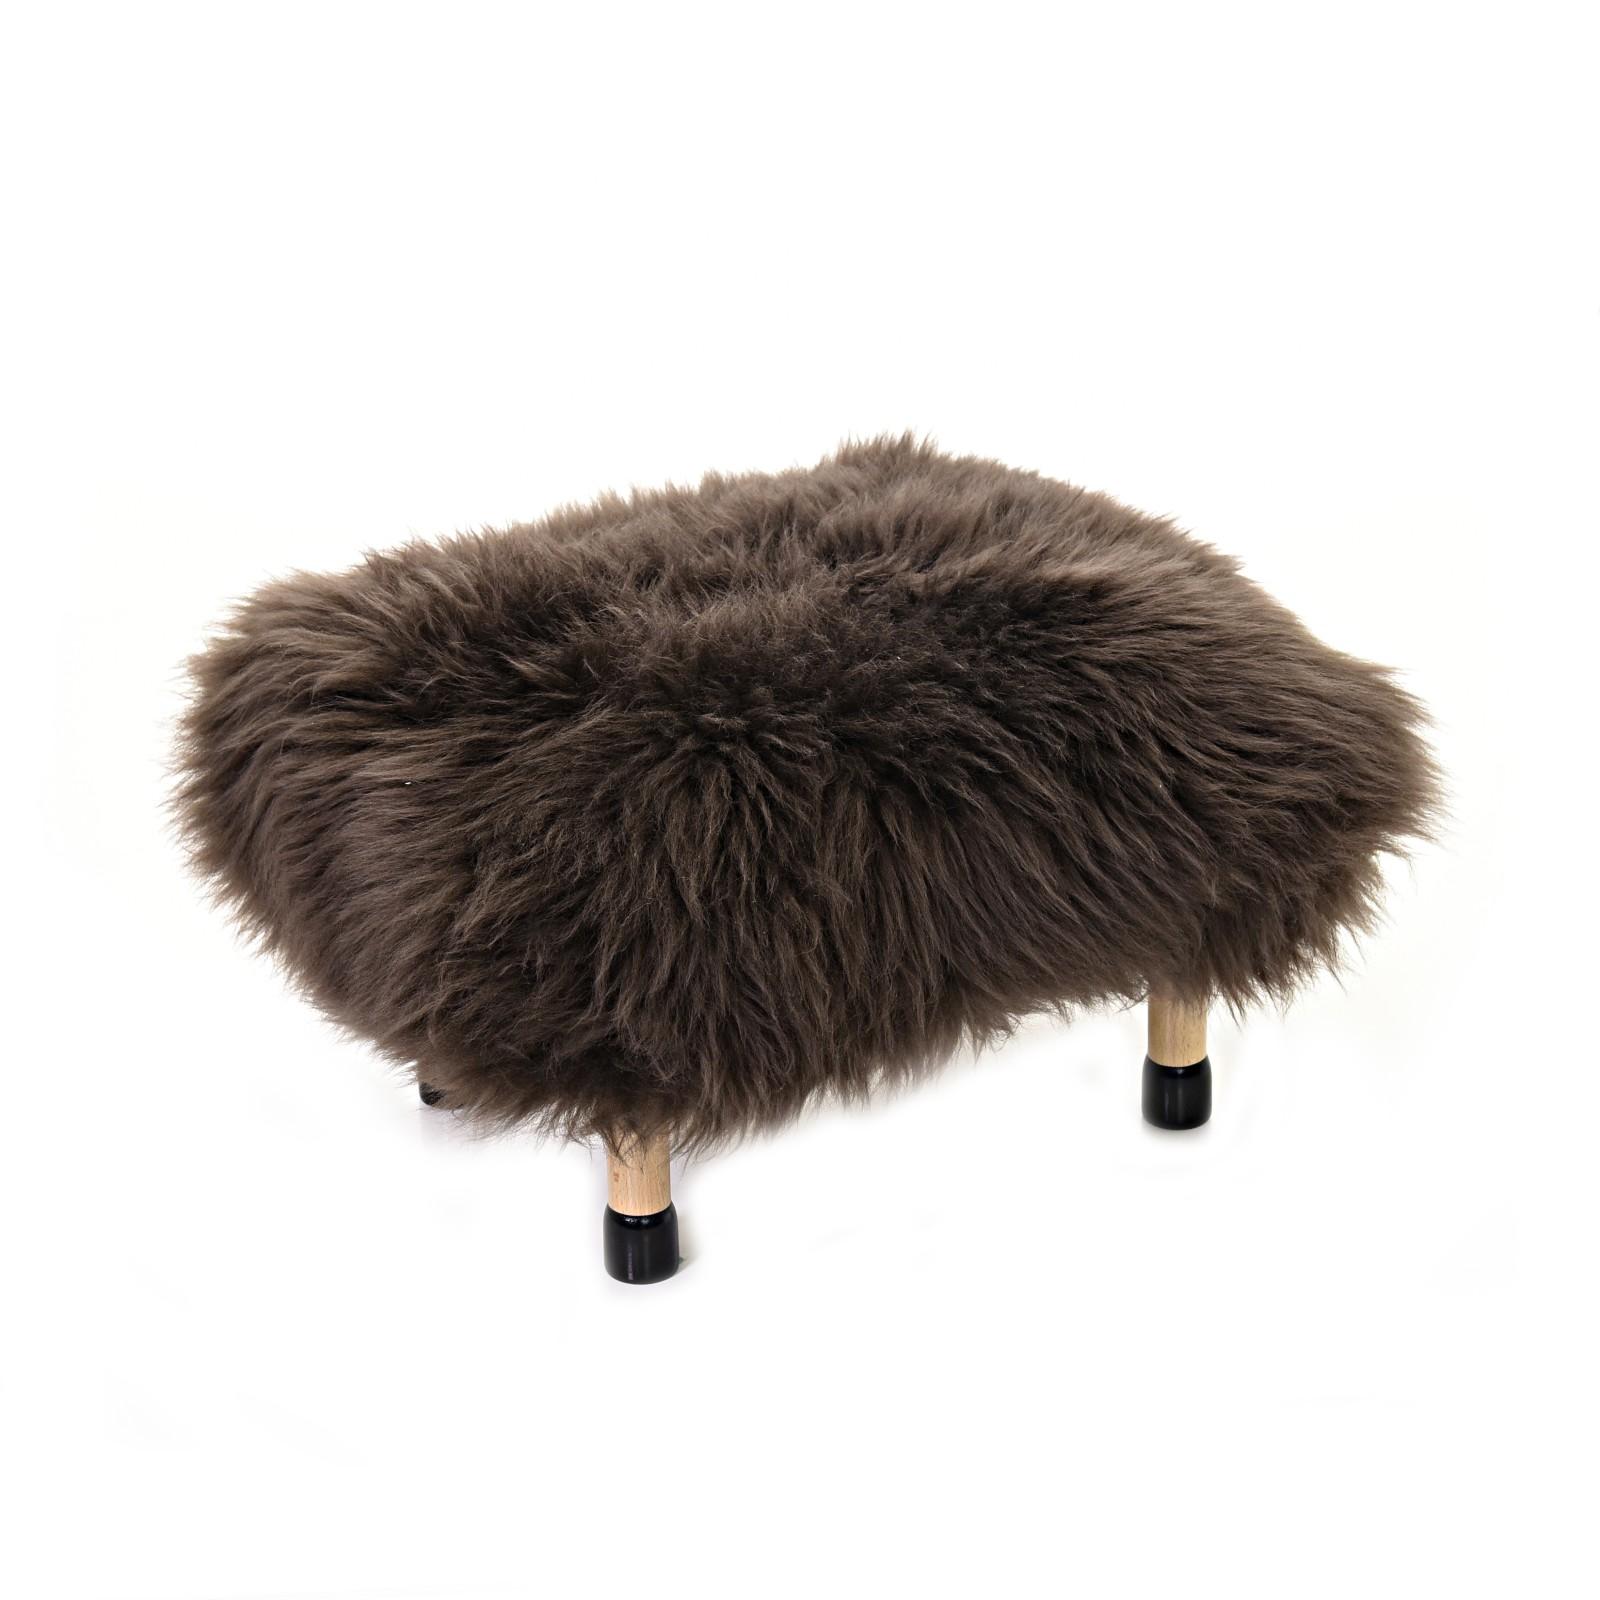 Nia - Sheepskin Footstool Mink